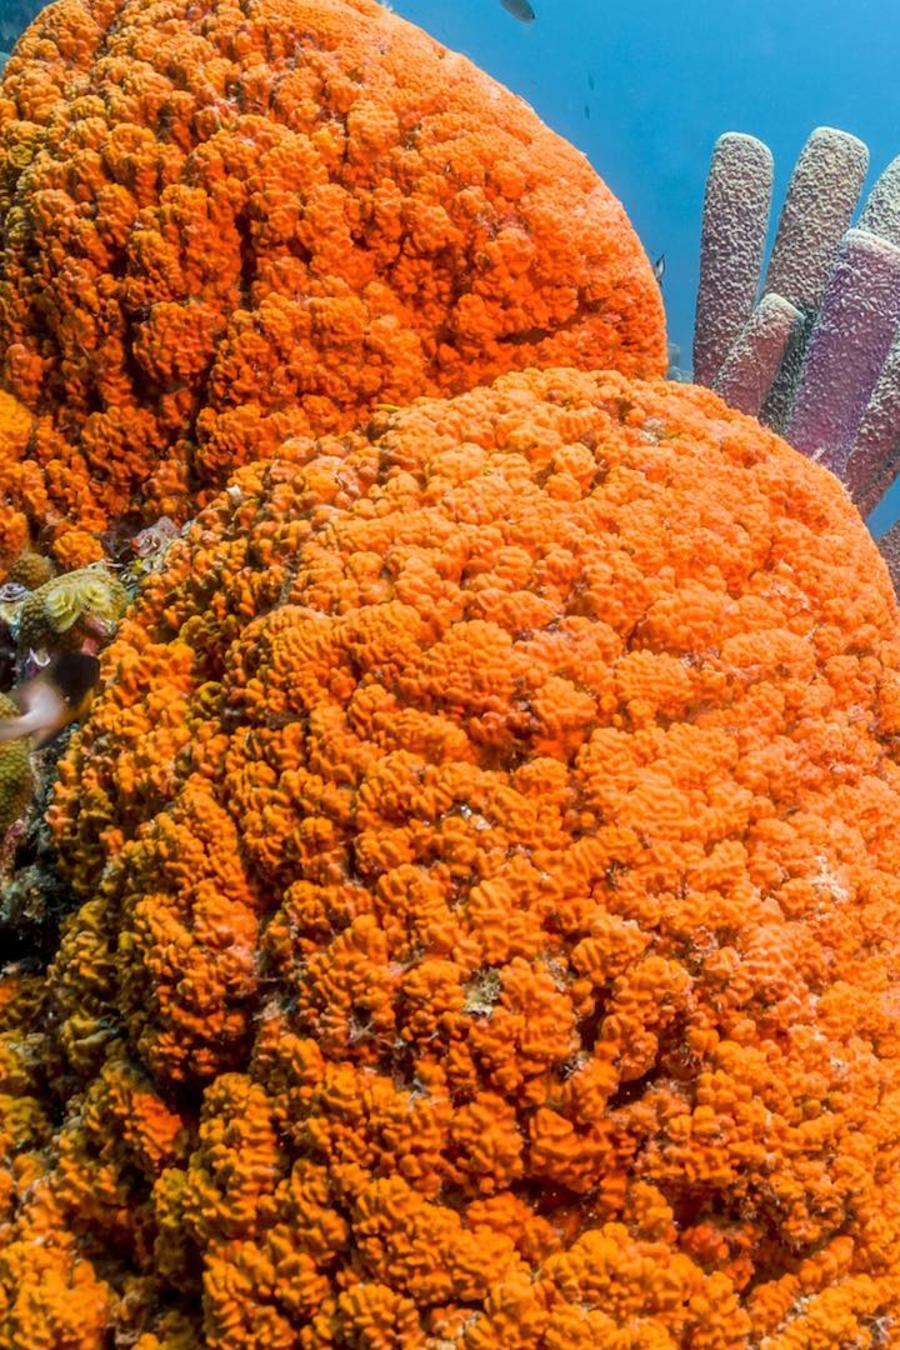 Esponja de mar naranja